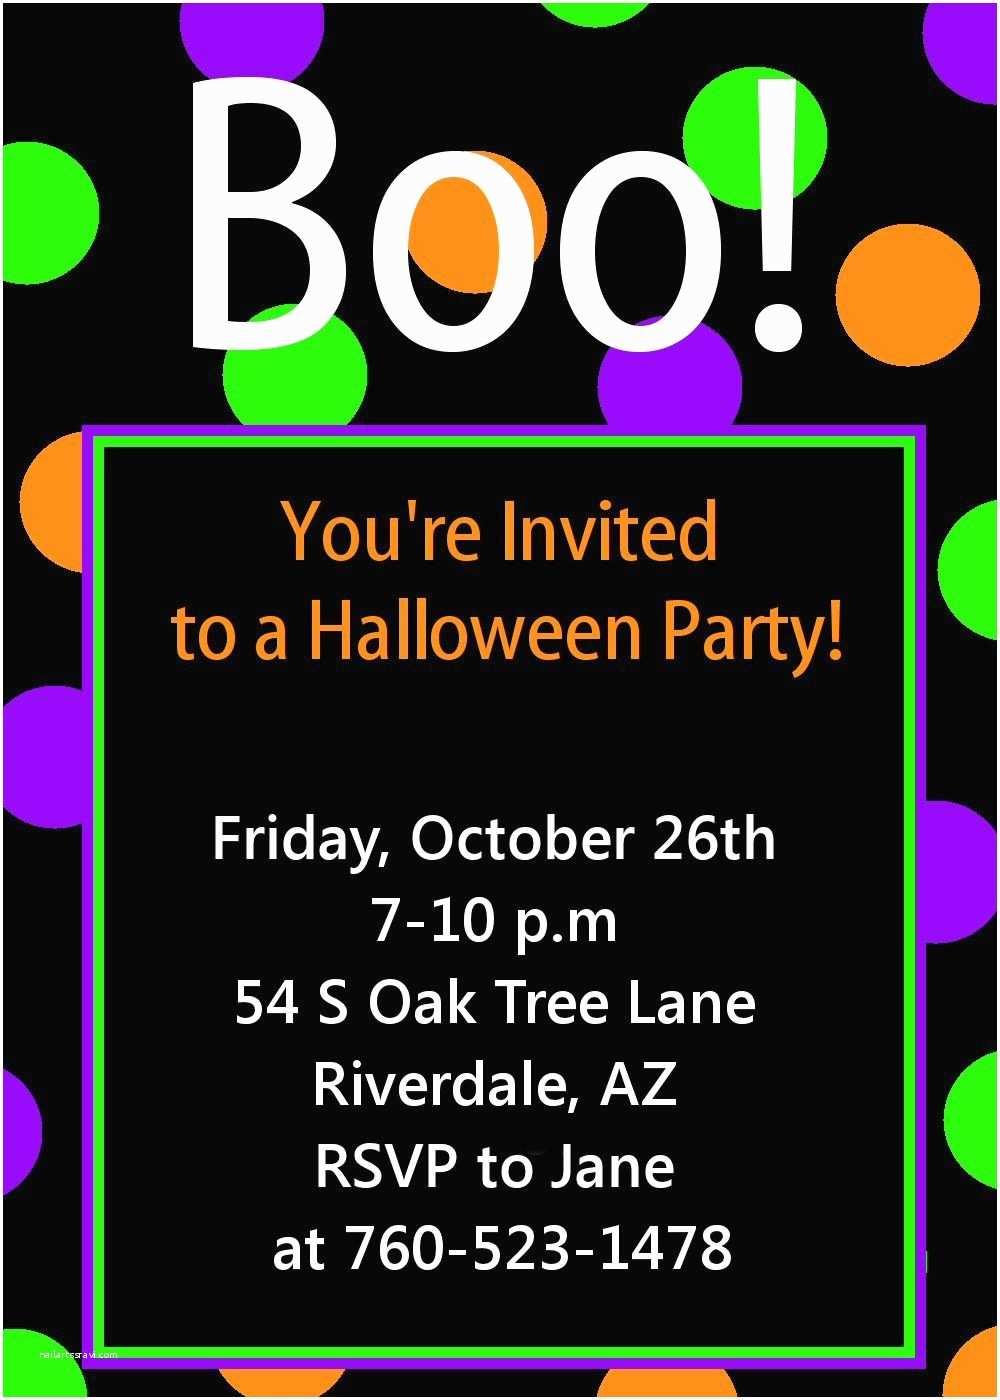 Free Halloween Party Invitations Free Printable Halloween Party Invitations Templates